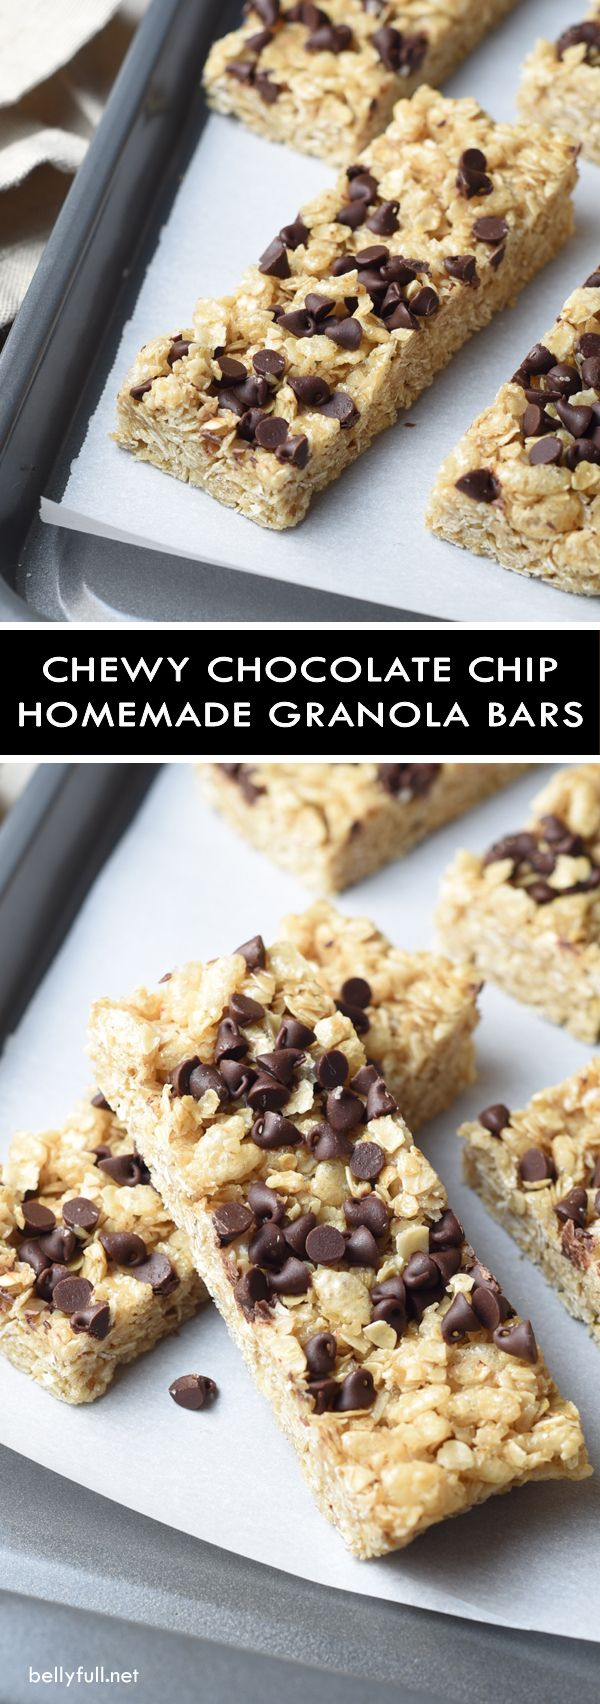 Chewy chocolate chip granola bars recipe